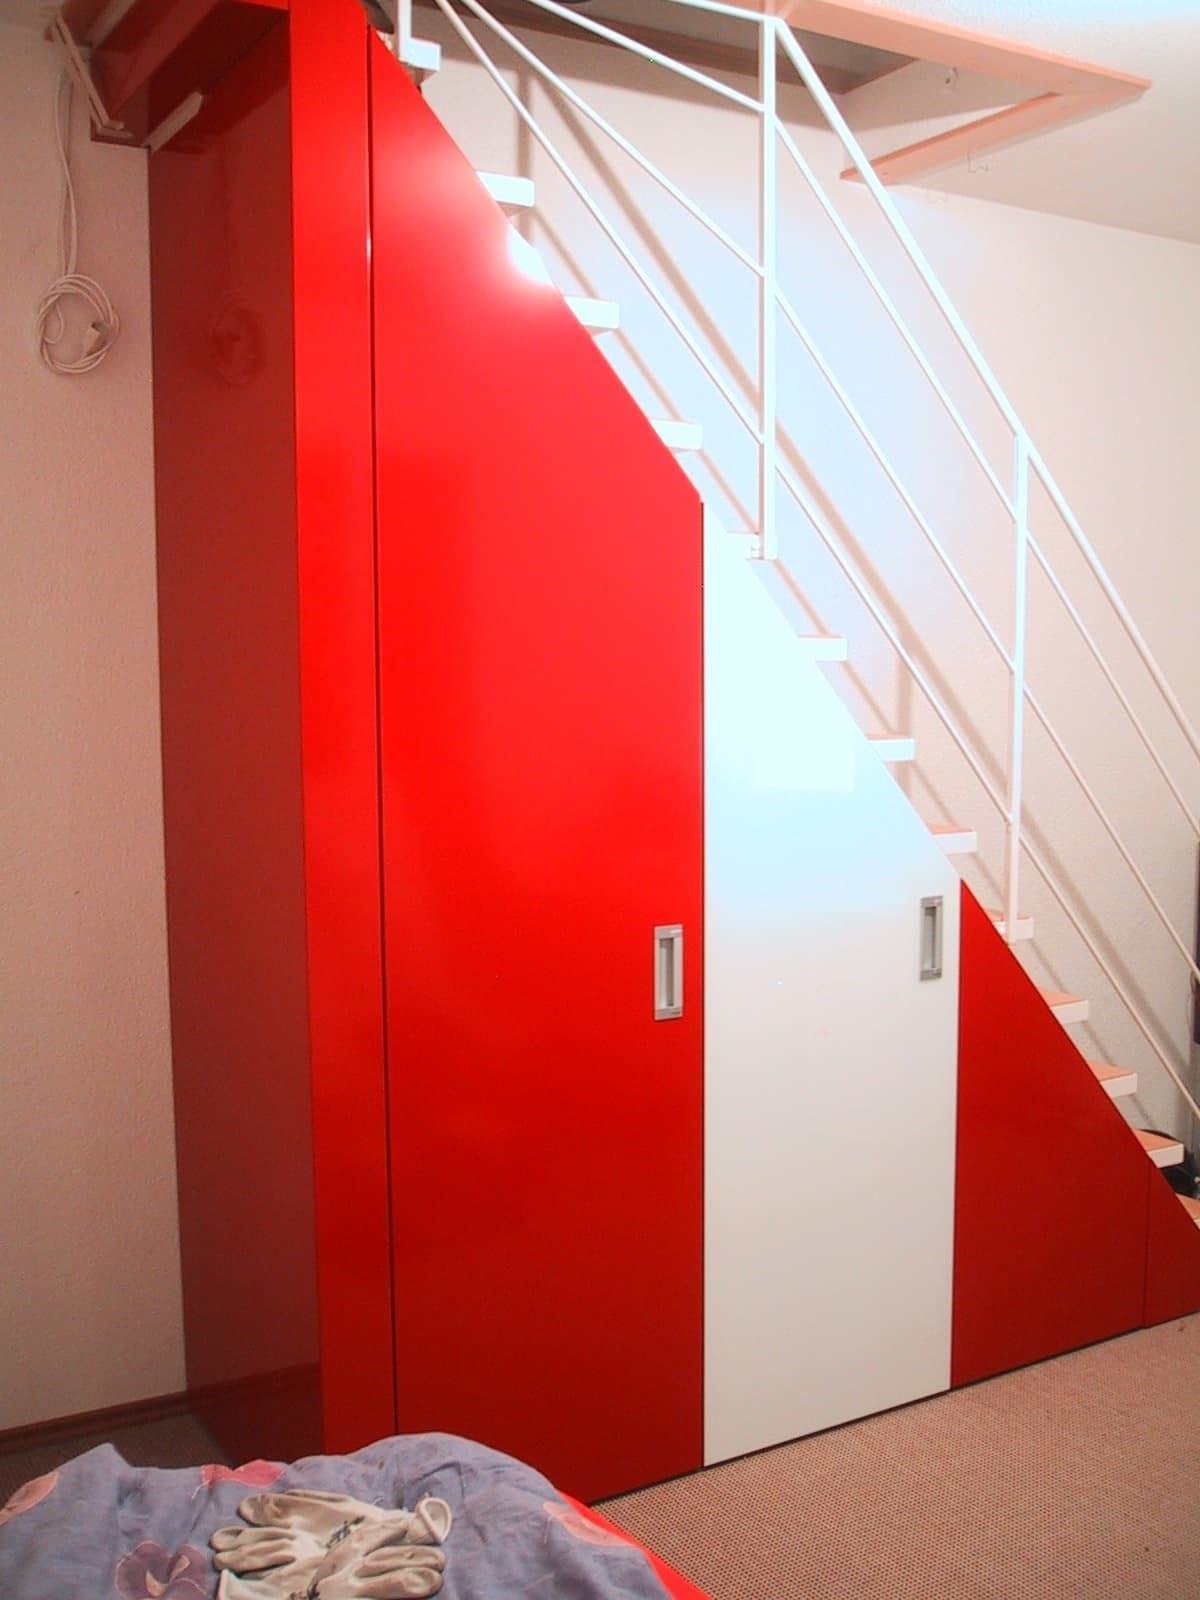 Under-stair bespoke closet, Closet under the stairs, tailormade